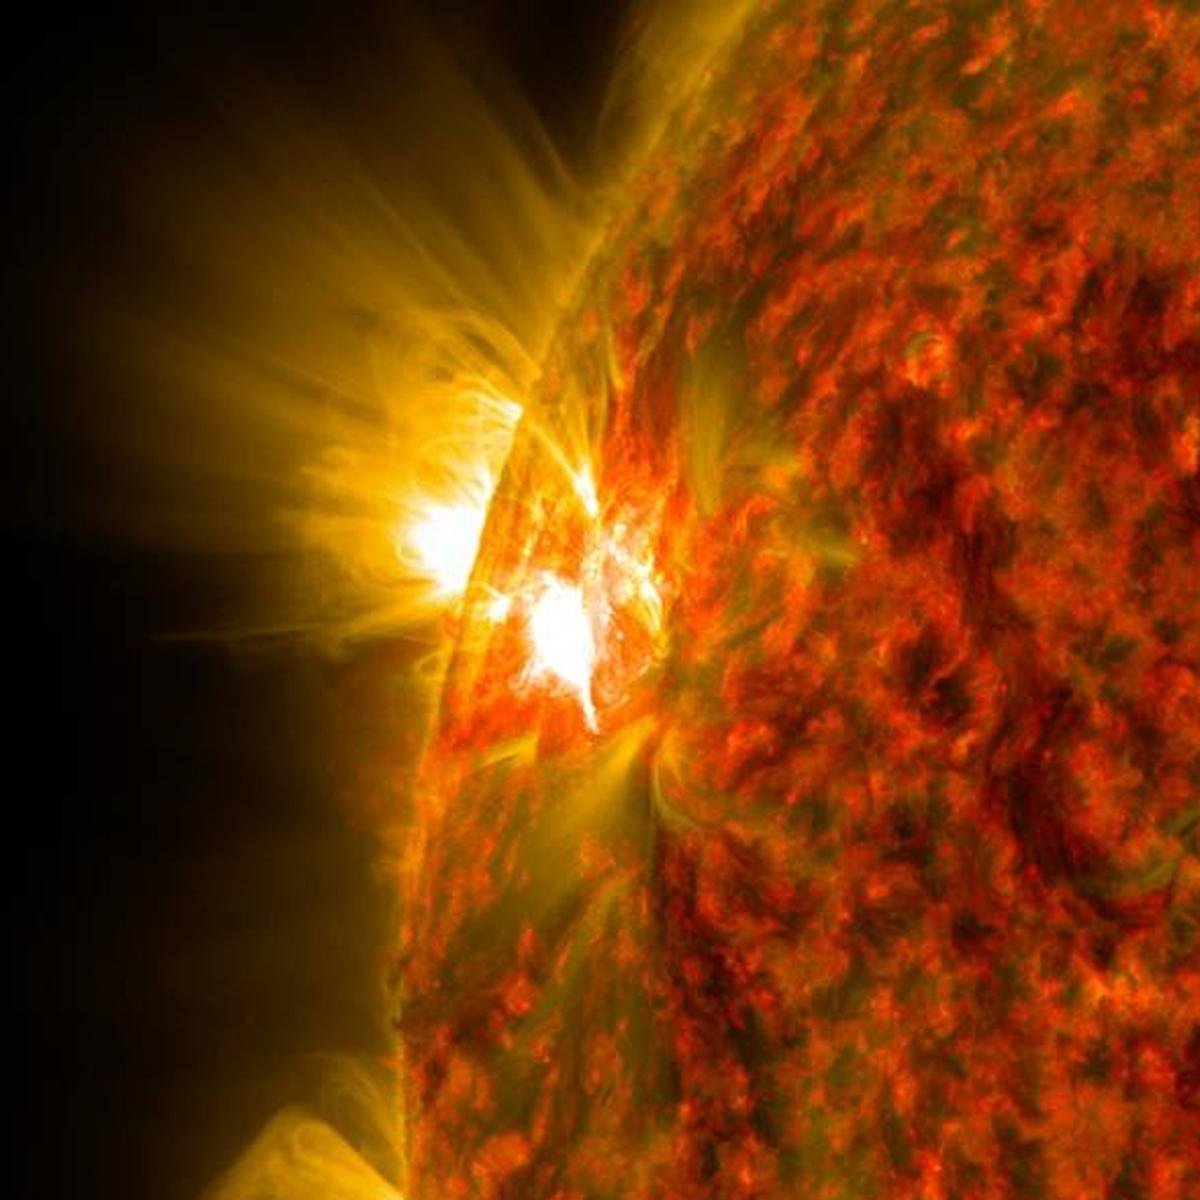 NASA image of a solar flare